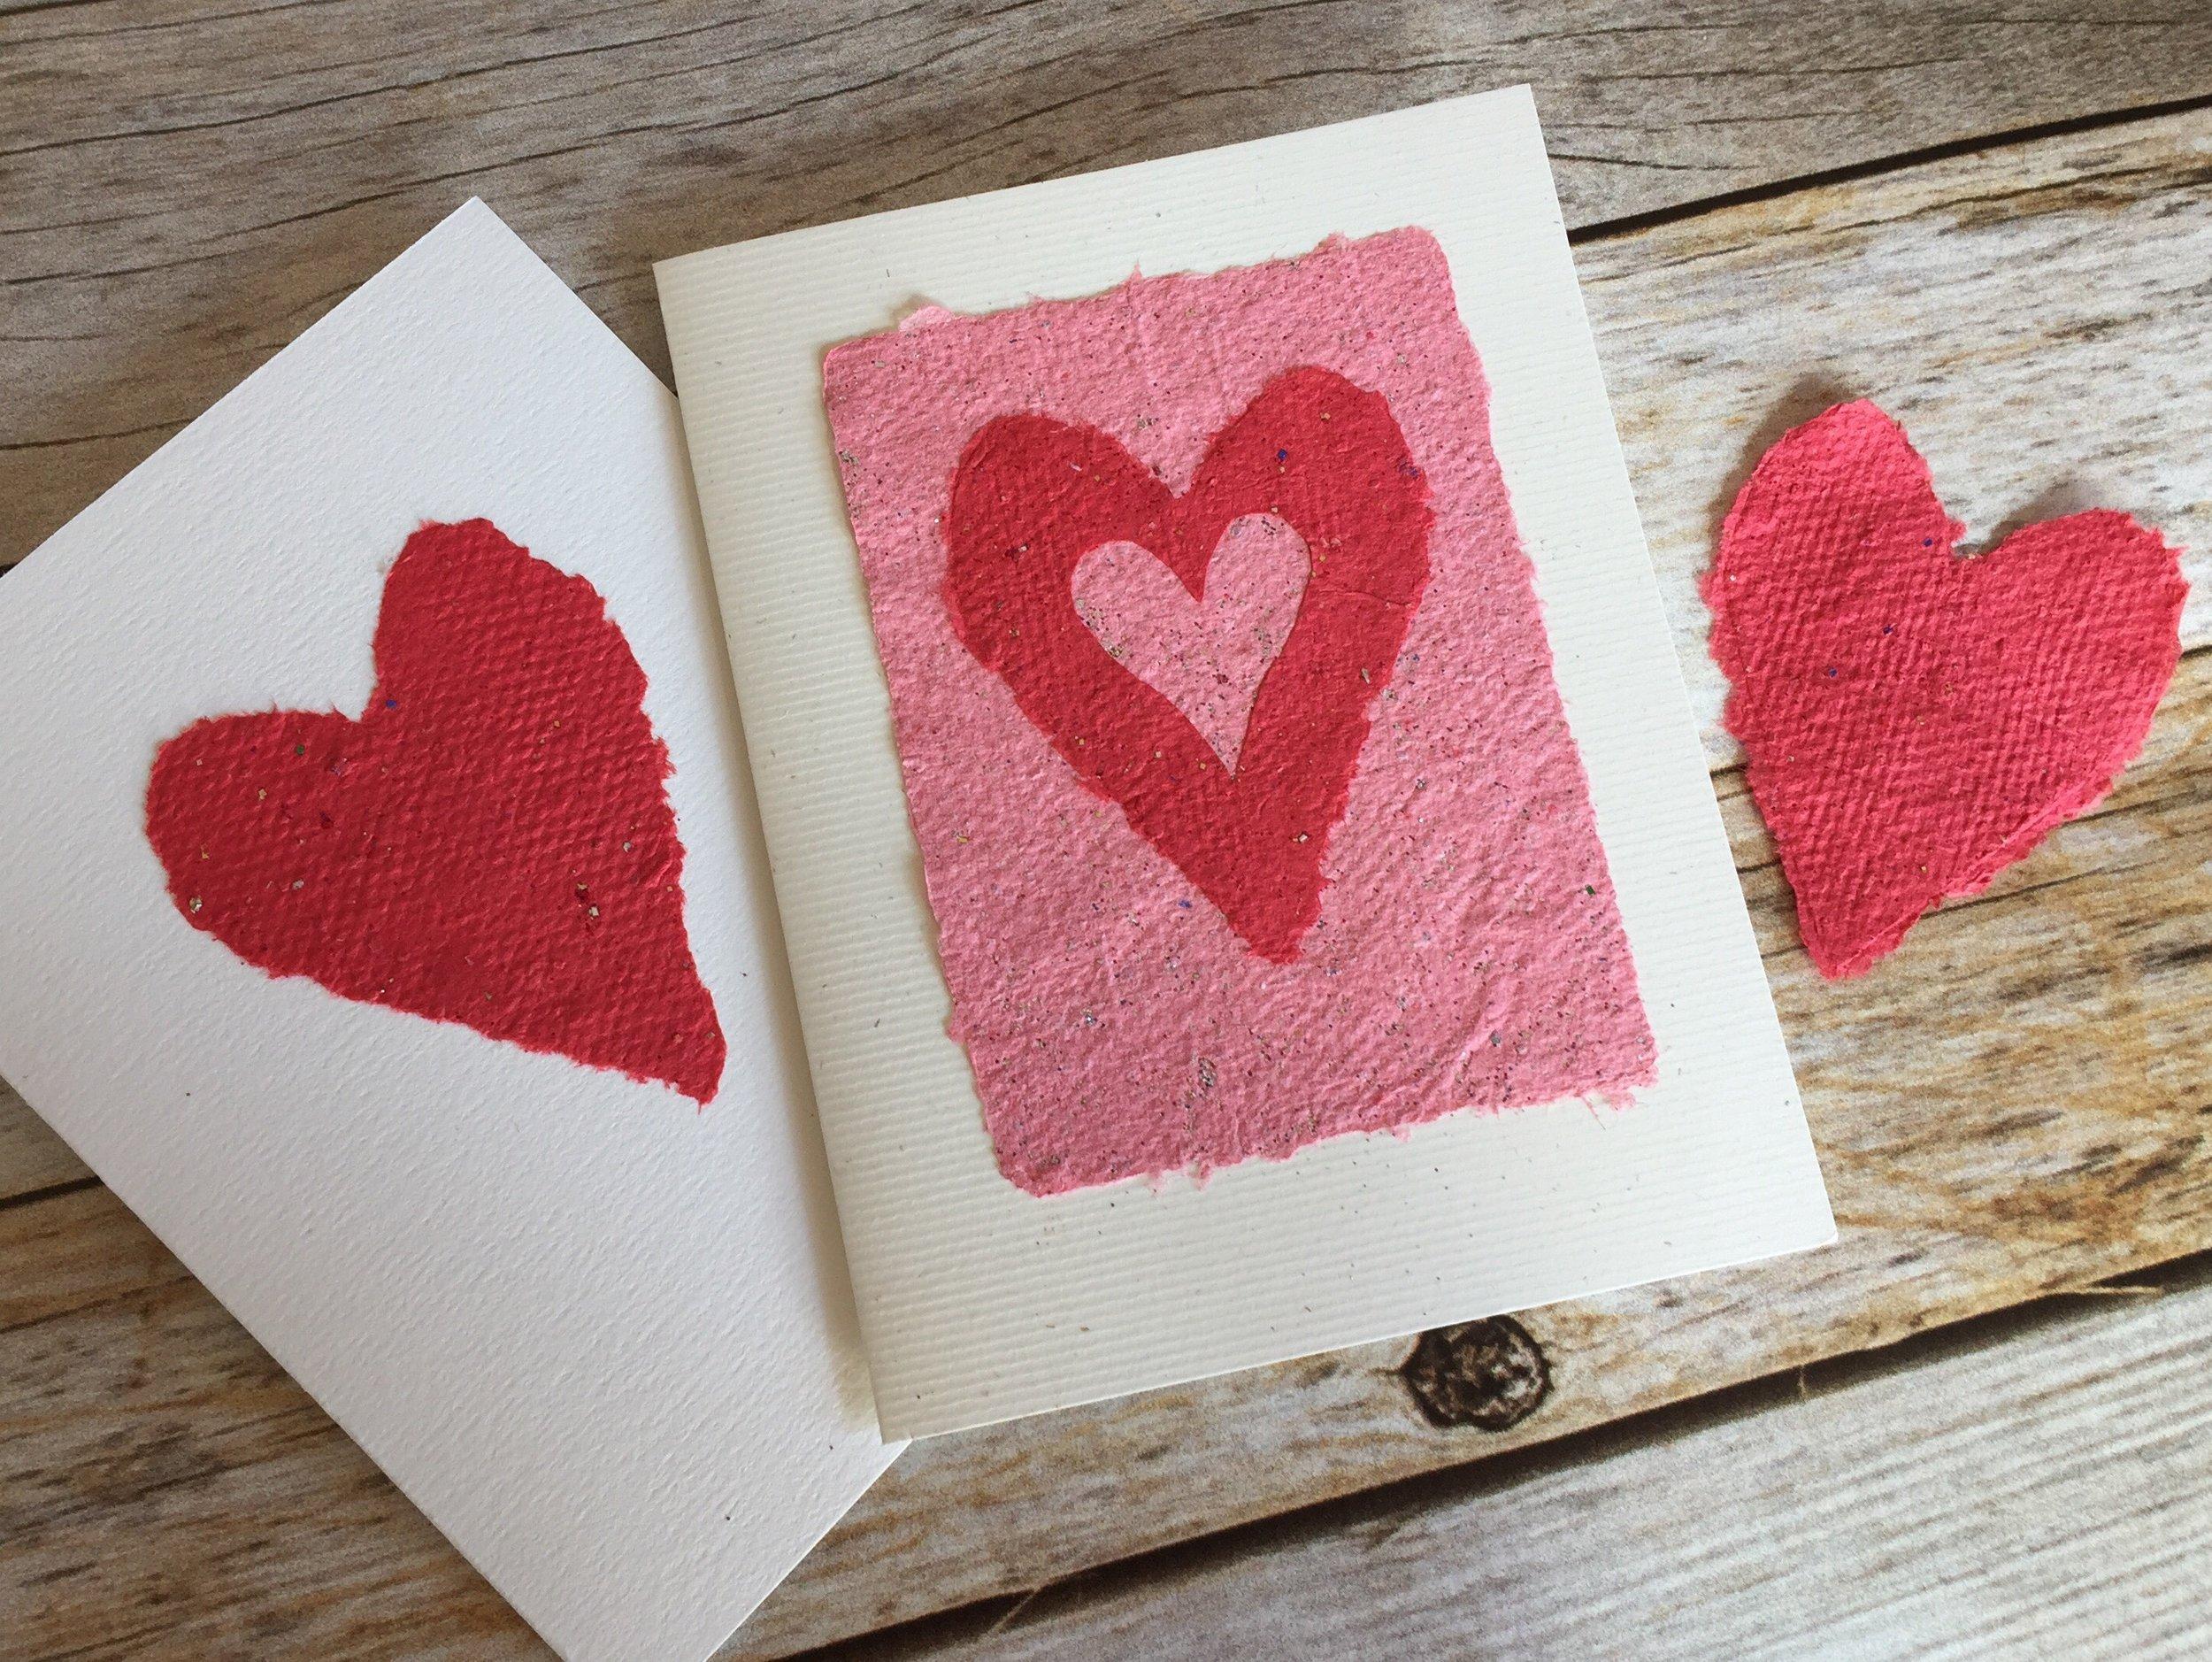 handmade-paper-hearts